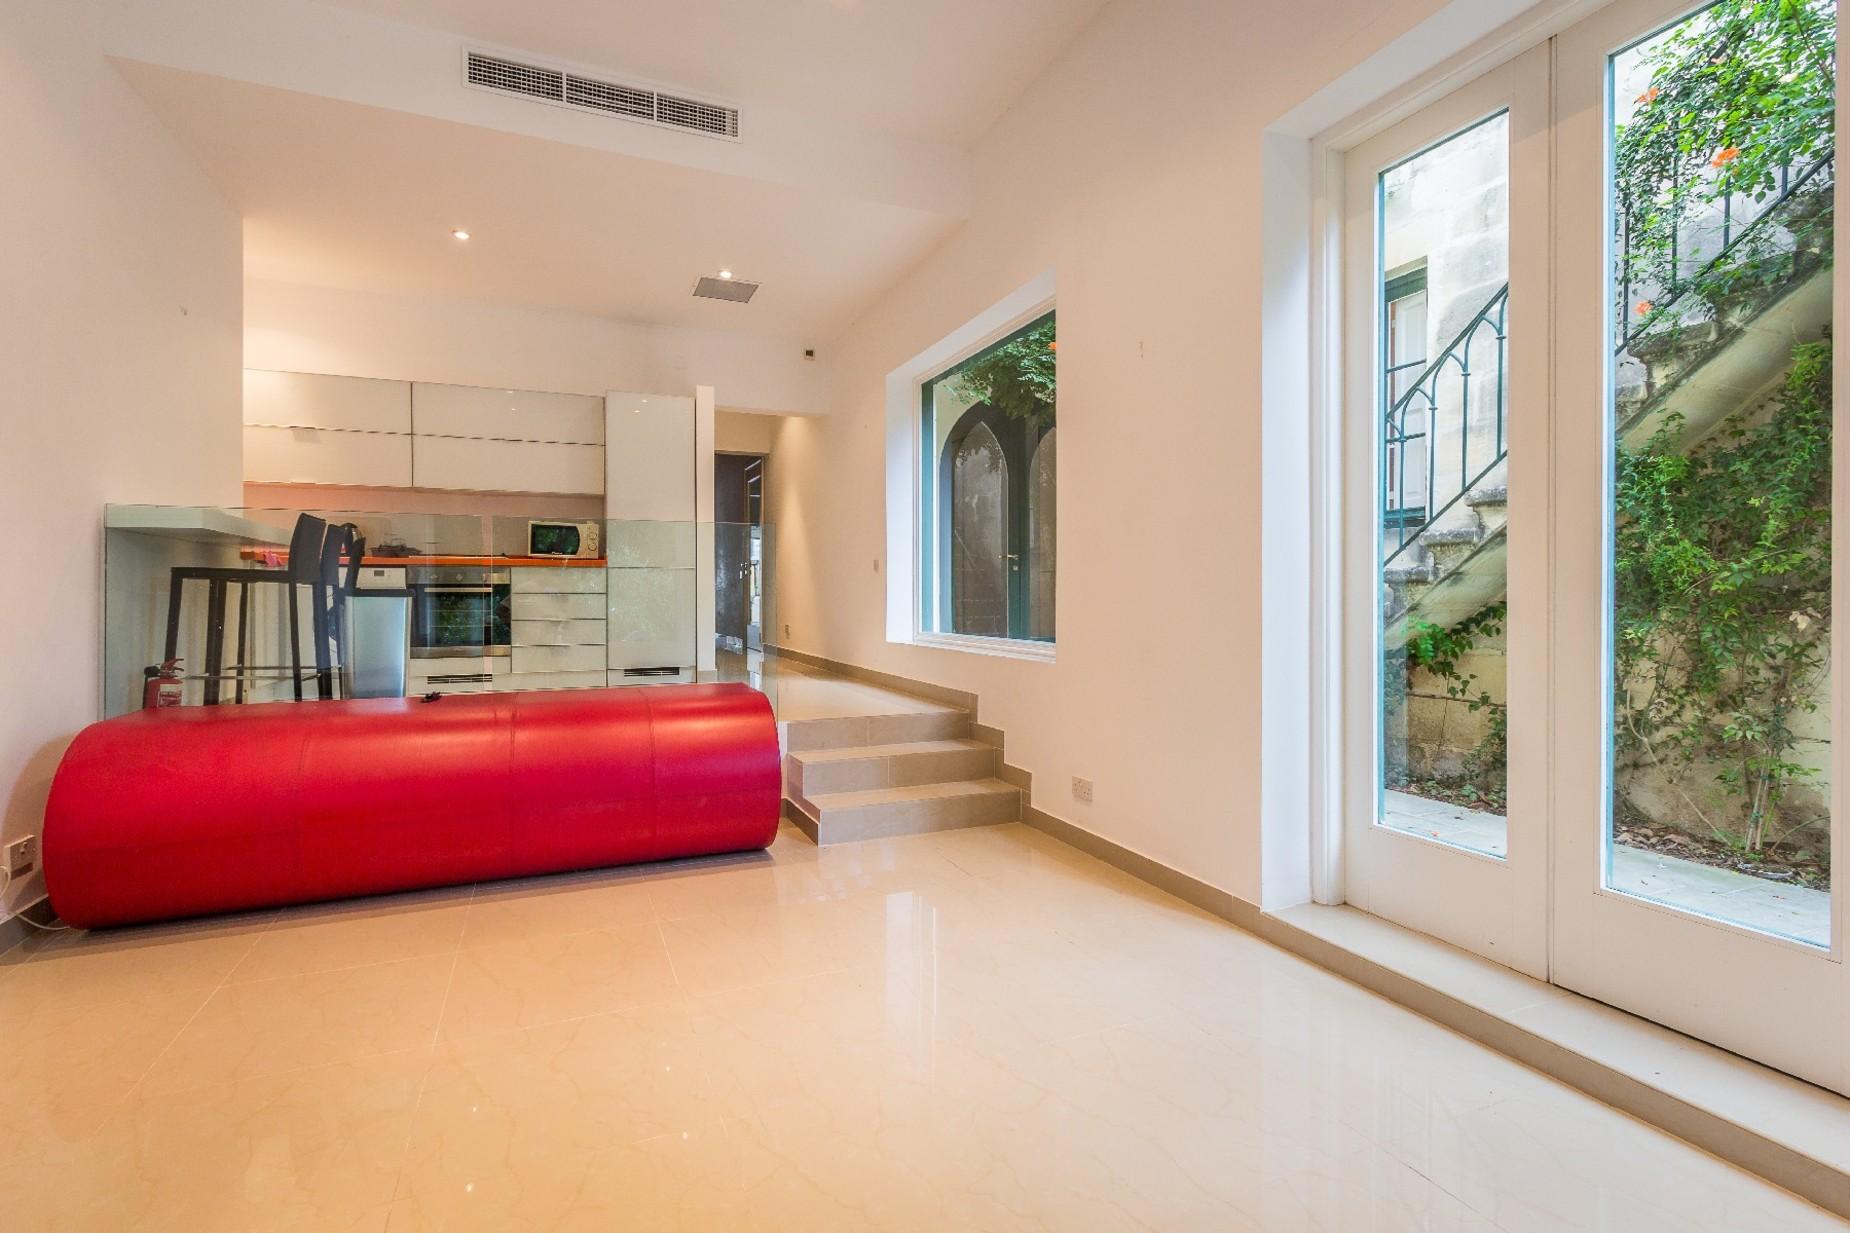 6 bed Palazzo For Rent in Balzan, Balzan - thumb 11